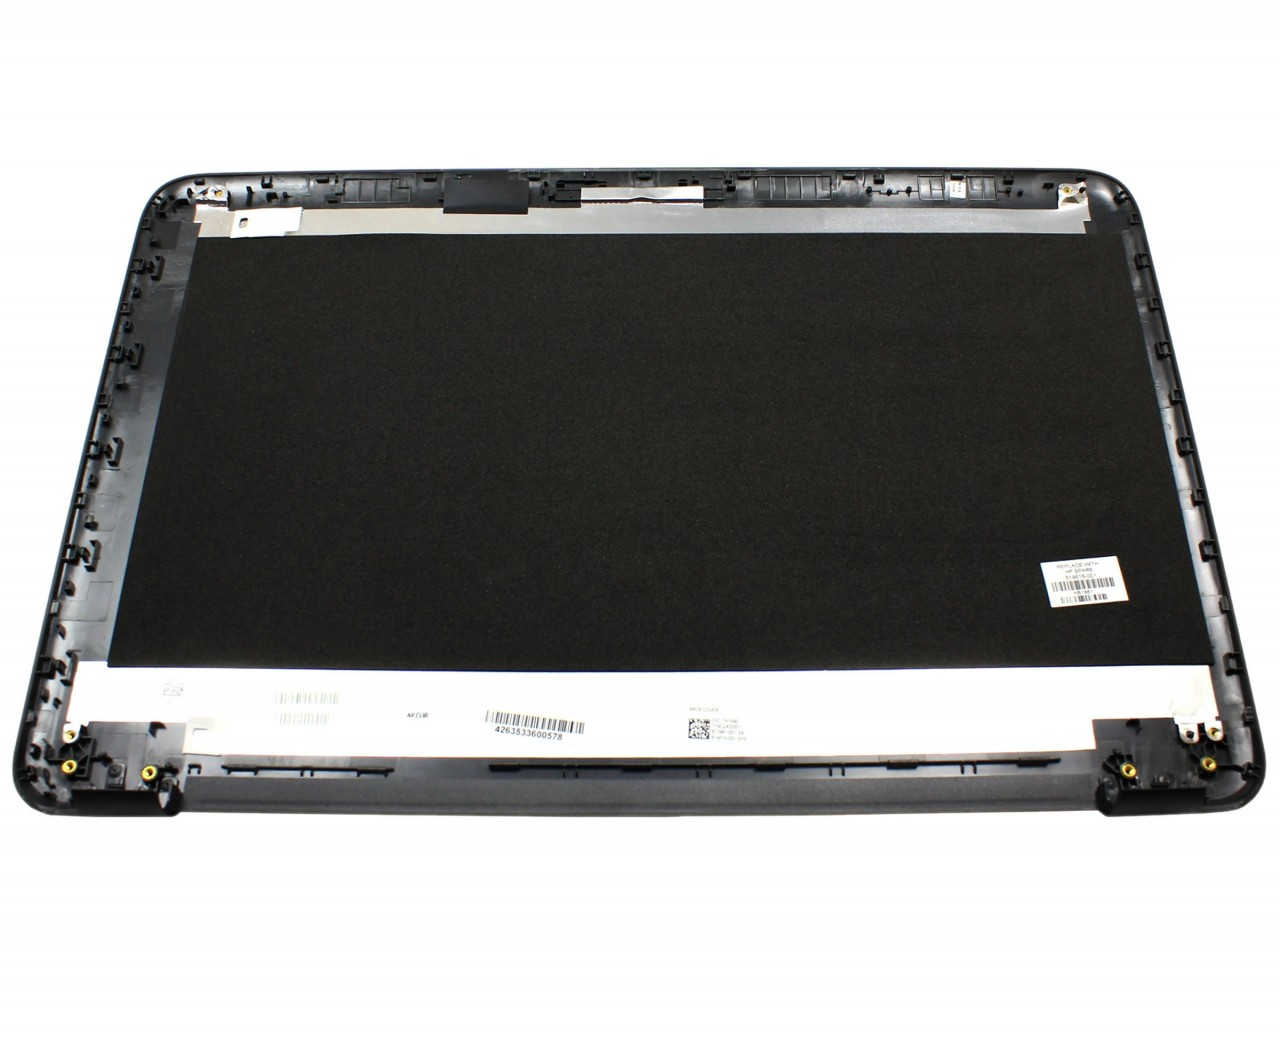 Capac Display BackCover HP 250 G4 Carcasa Display imagine powerlaptop.ro 2021